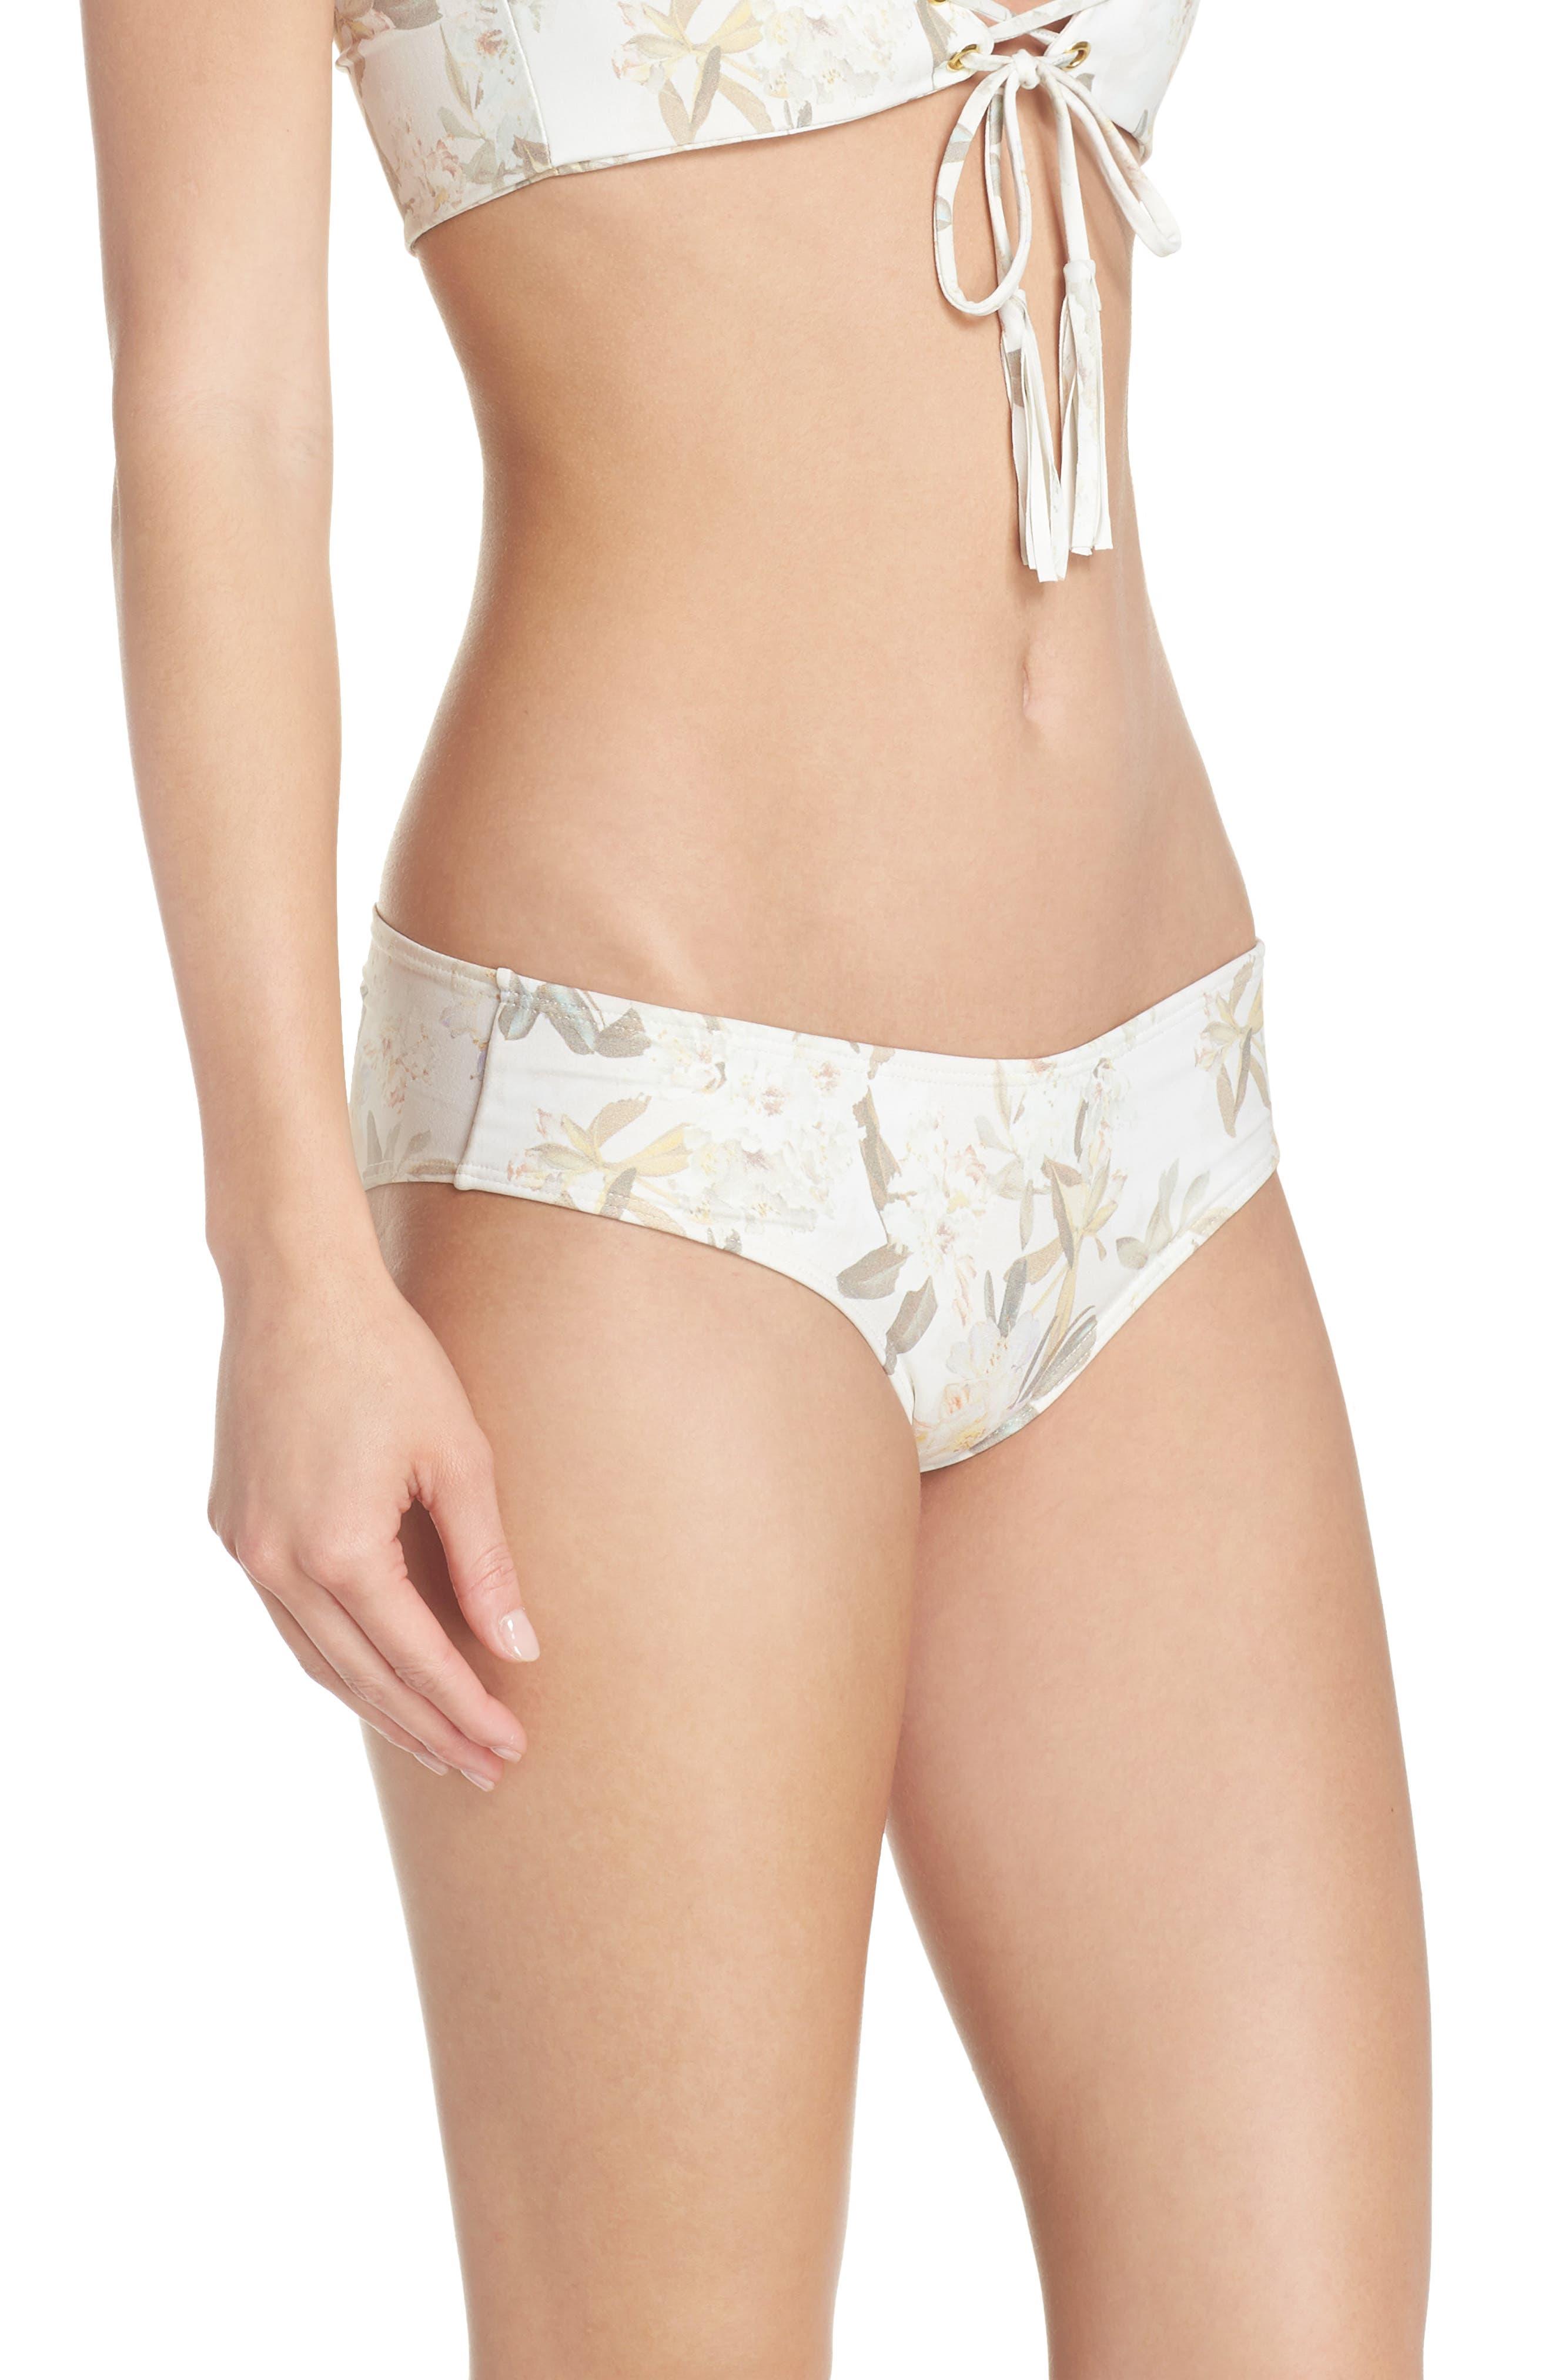 AC Nu Micro Bikini Bottoms,                             Alternate thumbnail 3, color,                             Ete Floral White